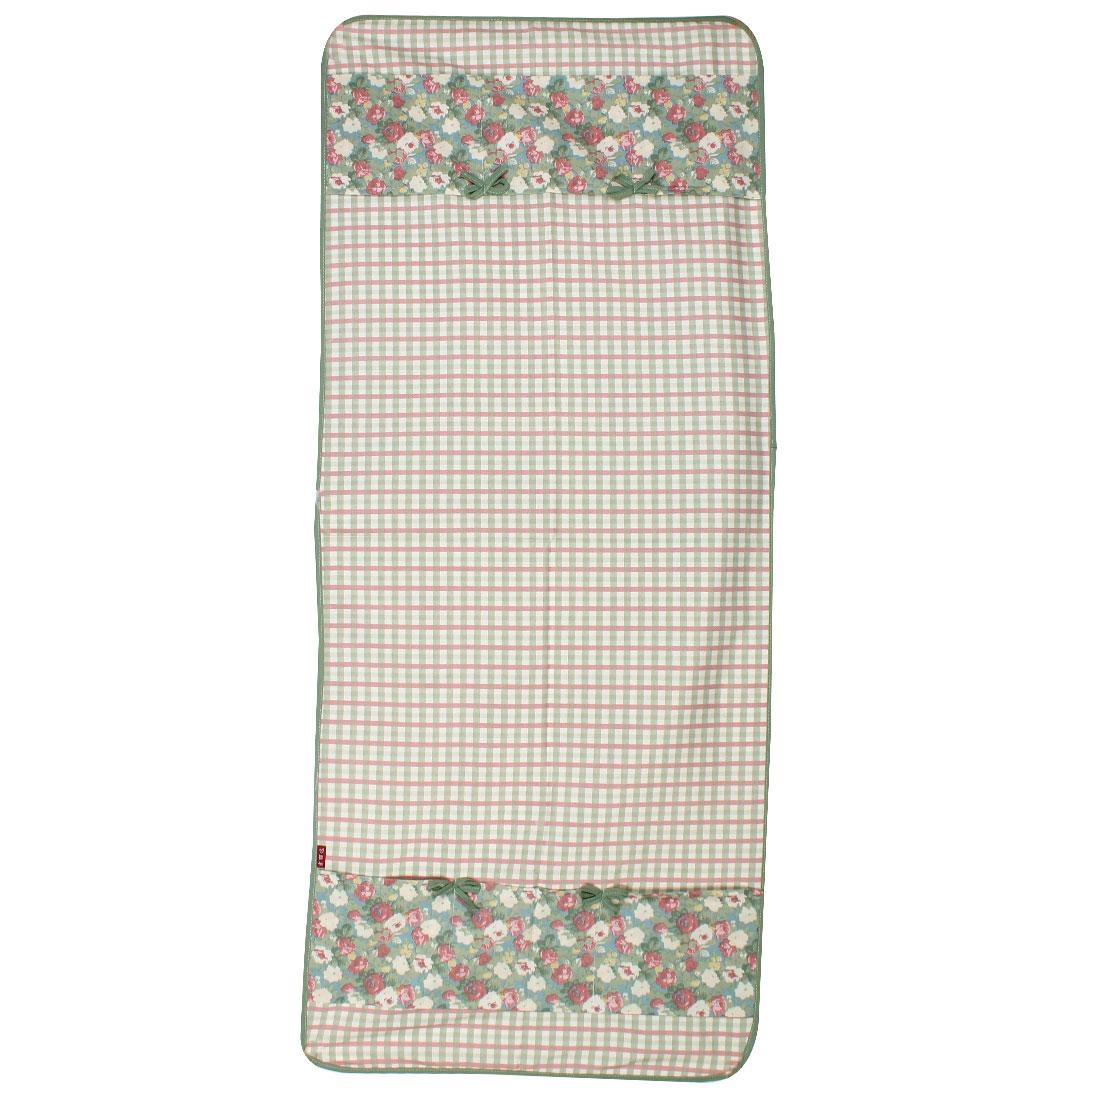 Grid Flower Pattern Refrigerator Dust Cover Organize Bag 60 x 140cm